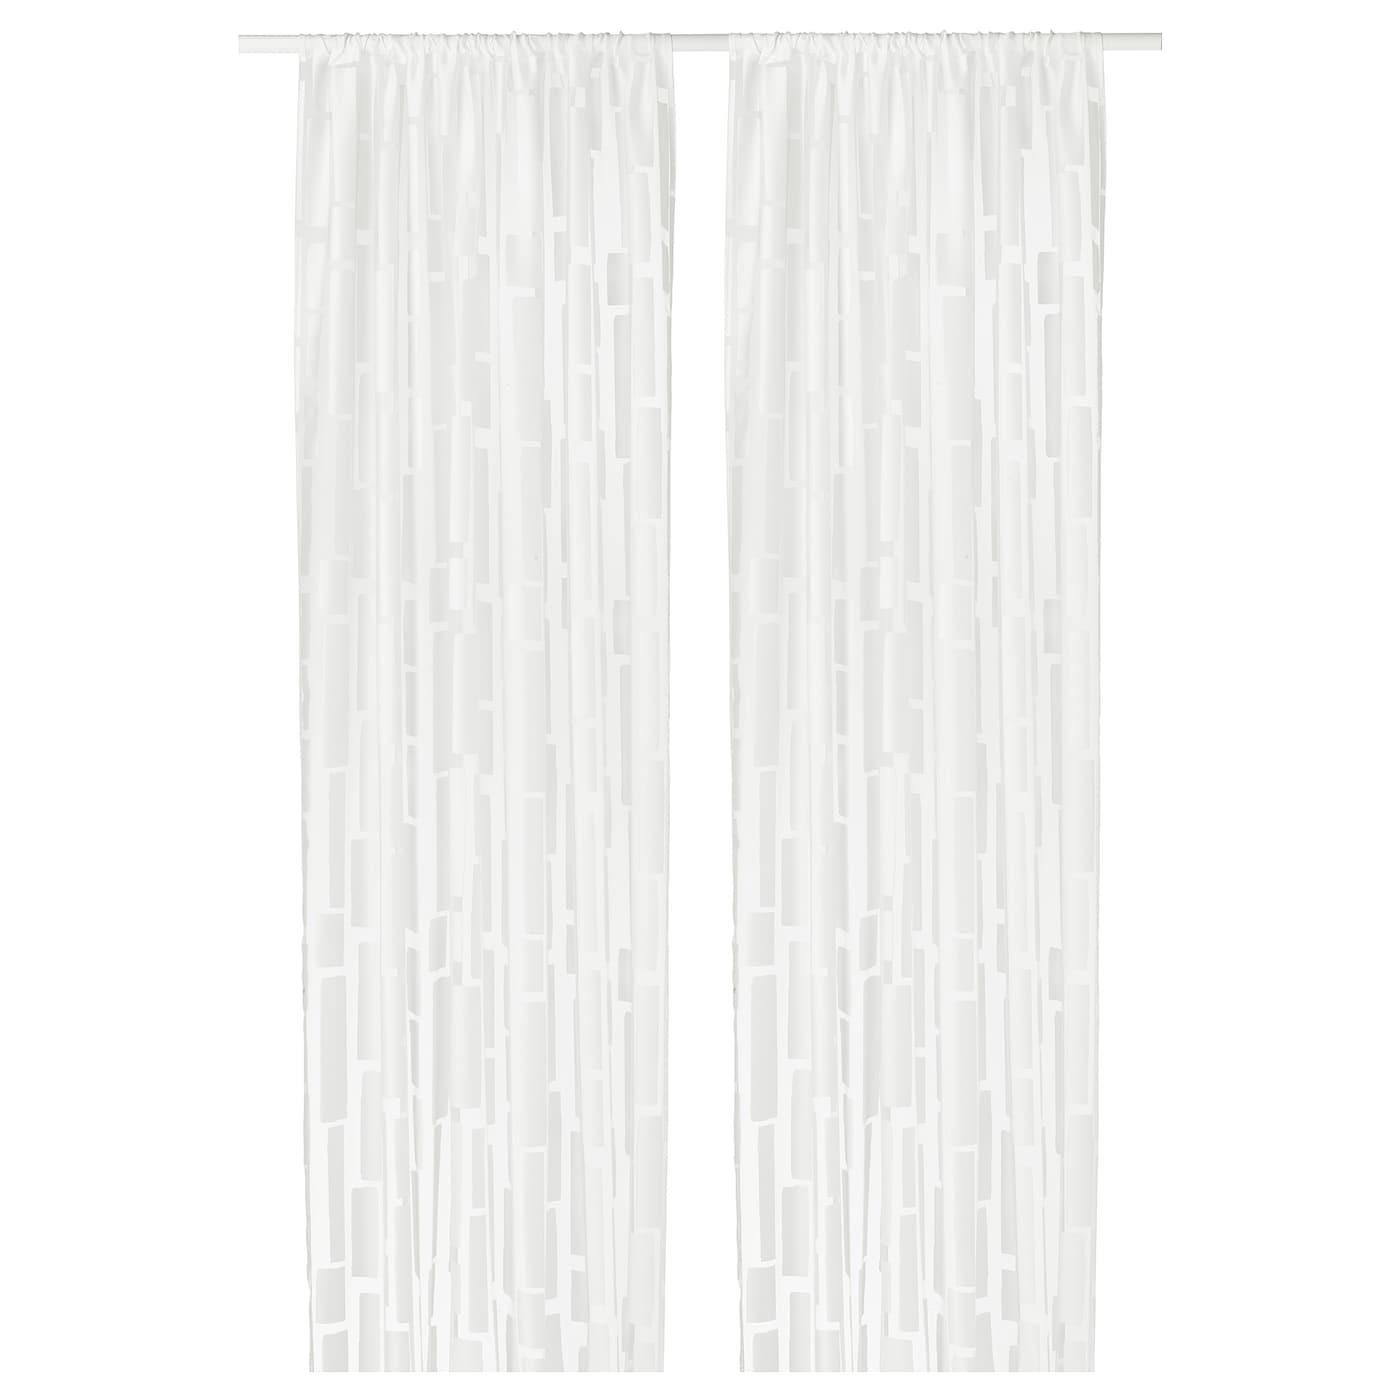 strandr g voilage 1 paire blanc 145x300 cm ikea. Black Bedroom Furniture Sets. Home Design Ideas